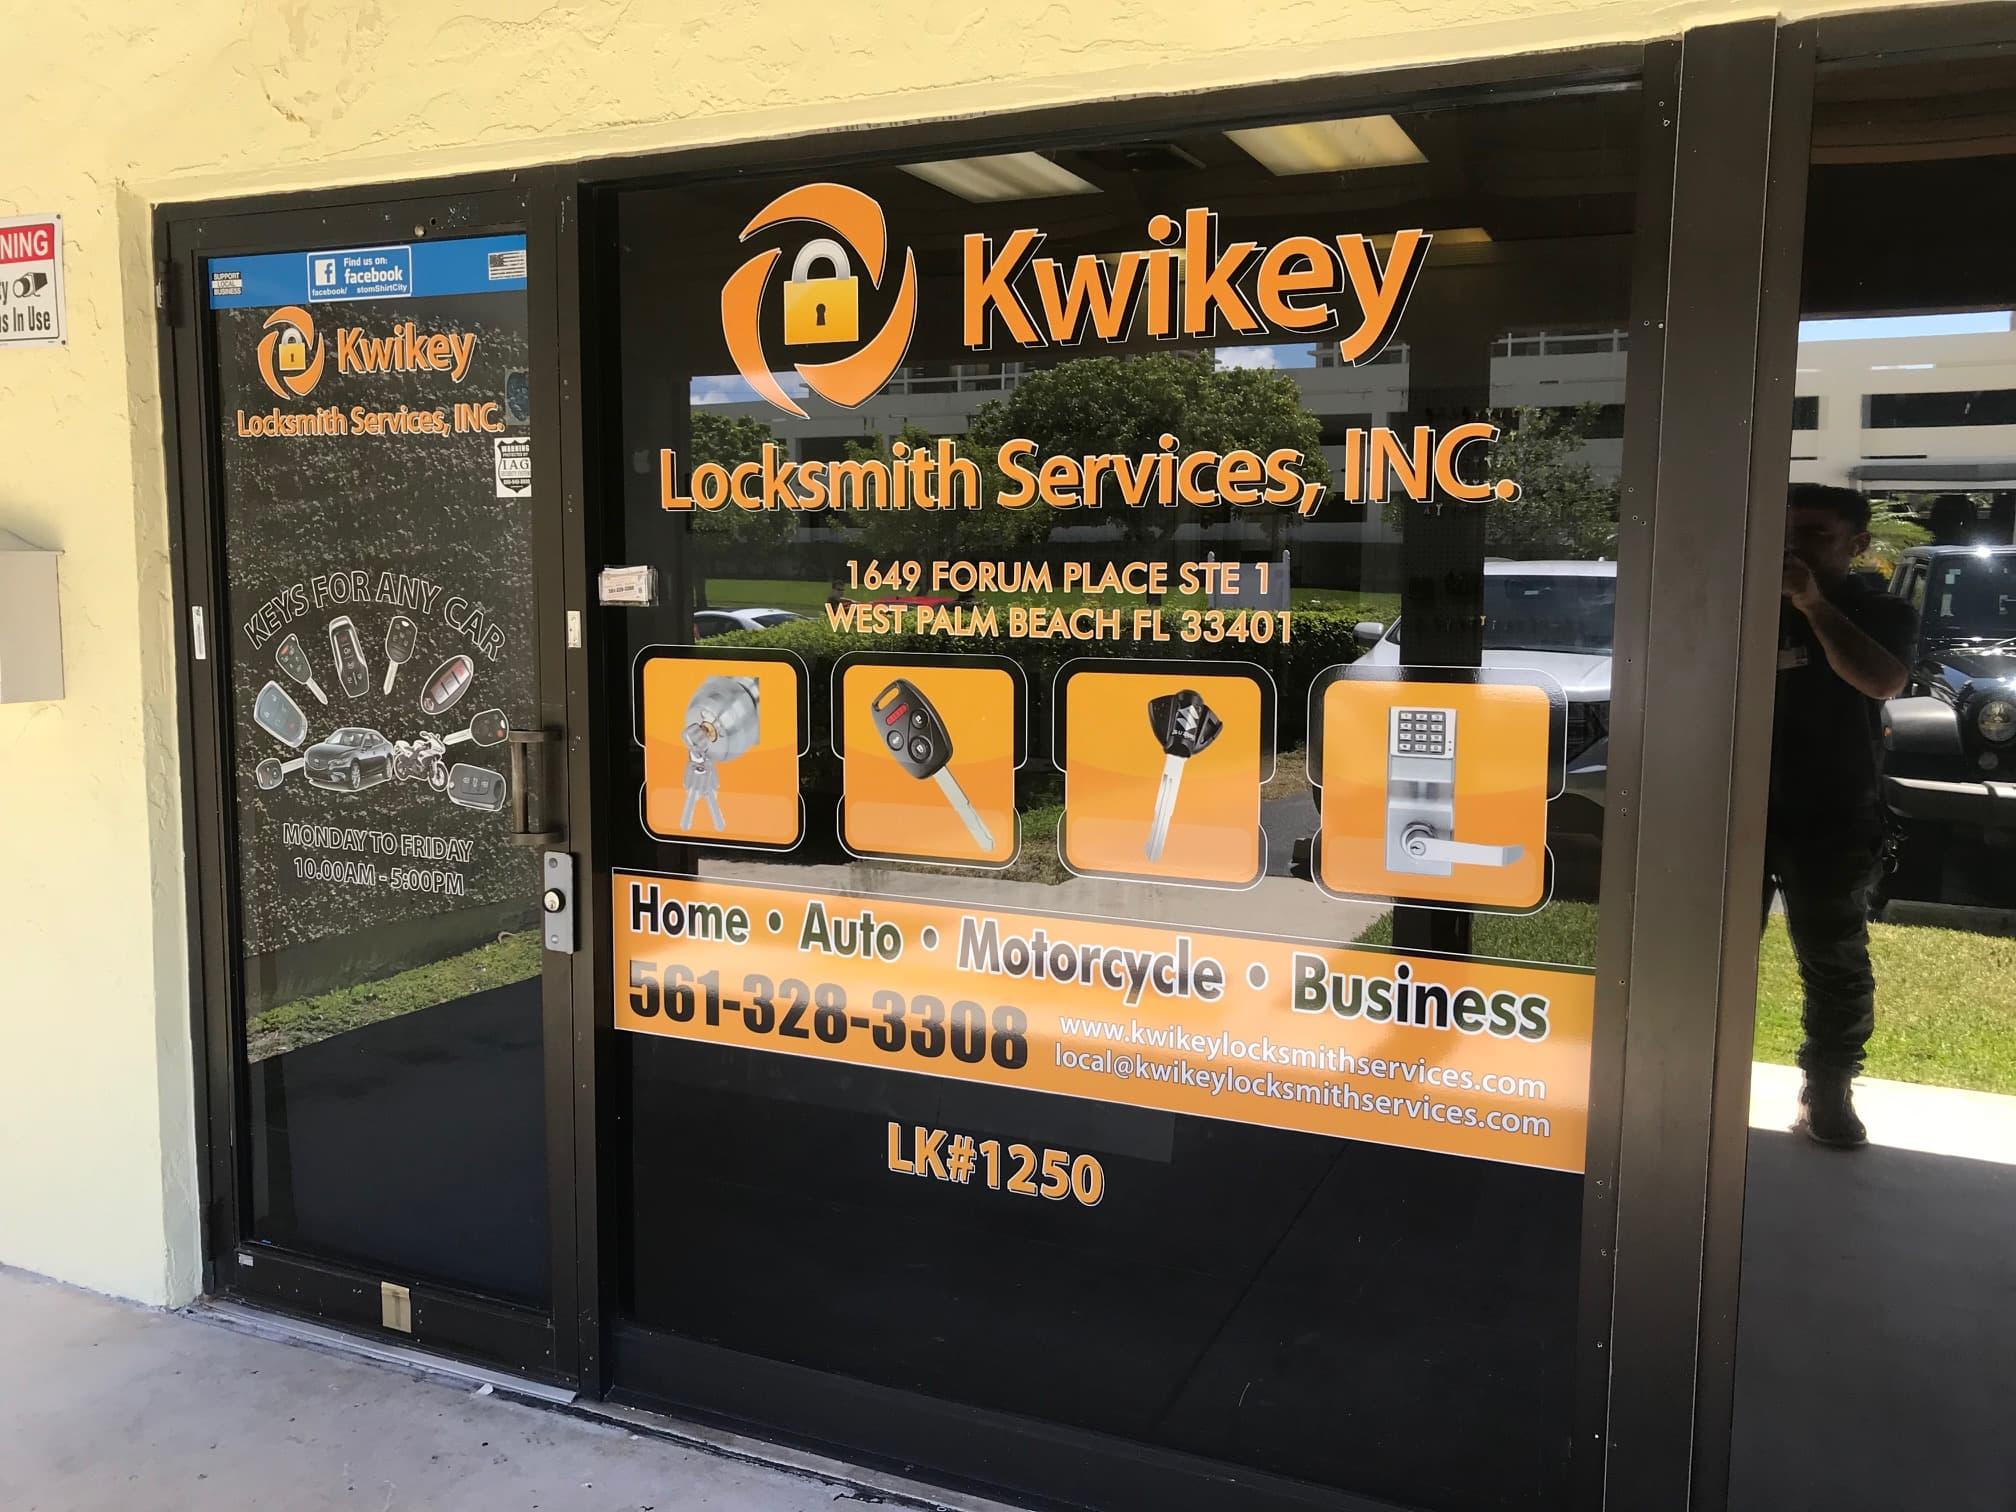 kwikey locksmith services inc